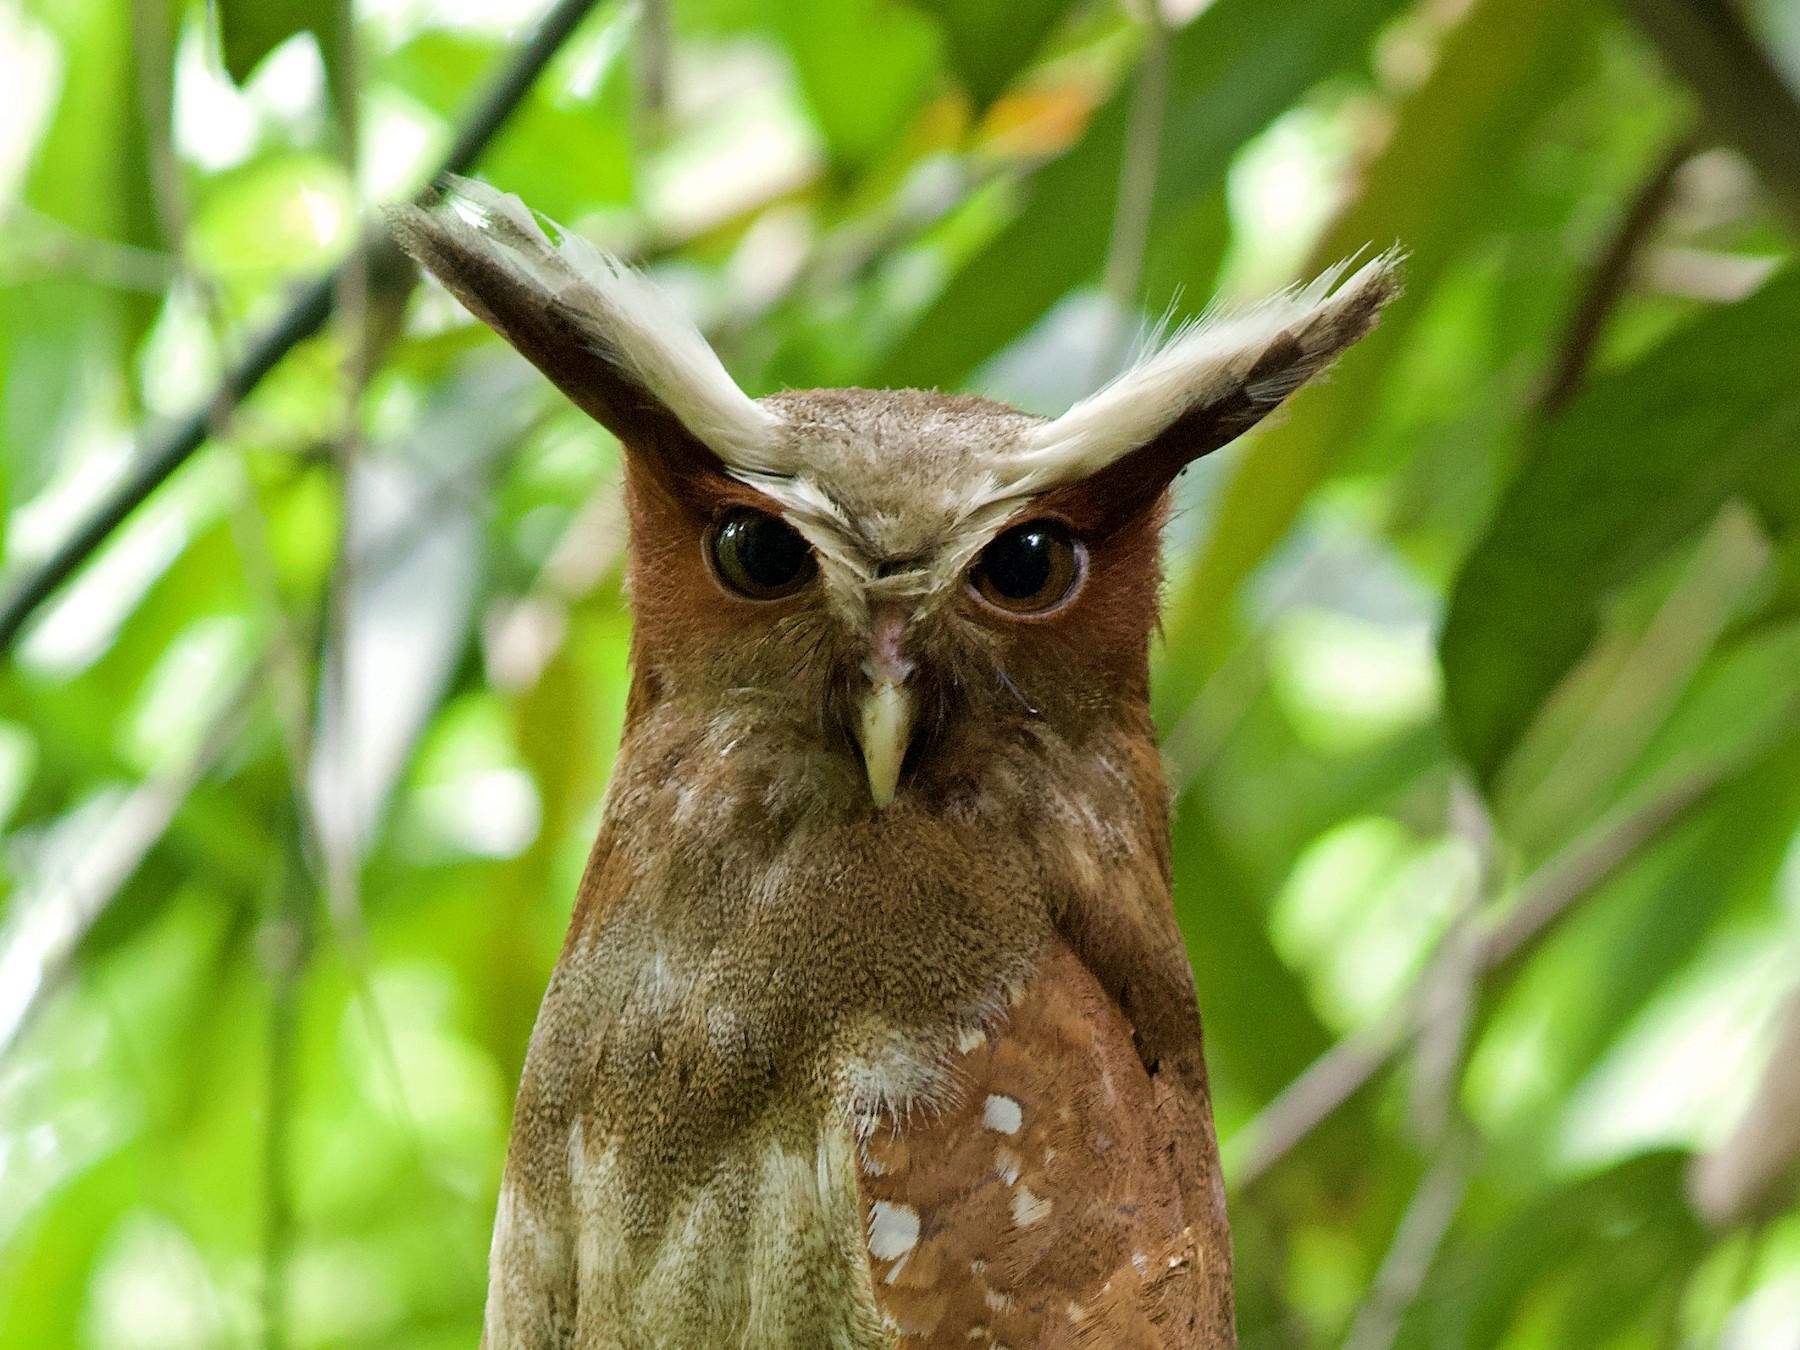 Crested Owl - Luiz Matos